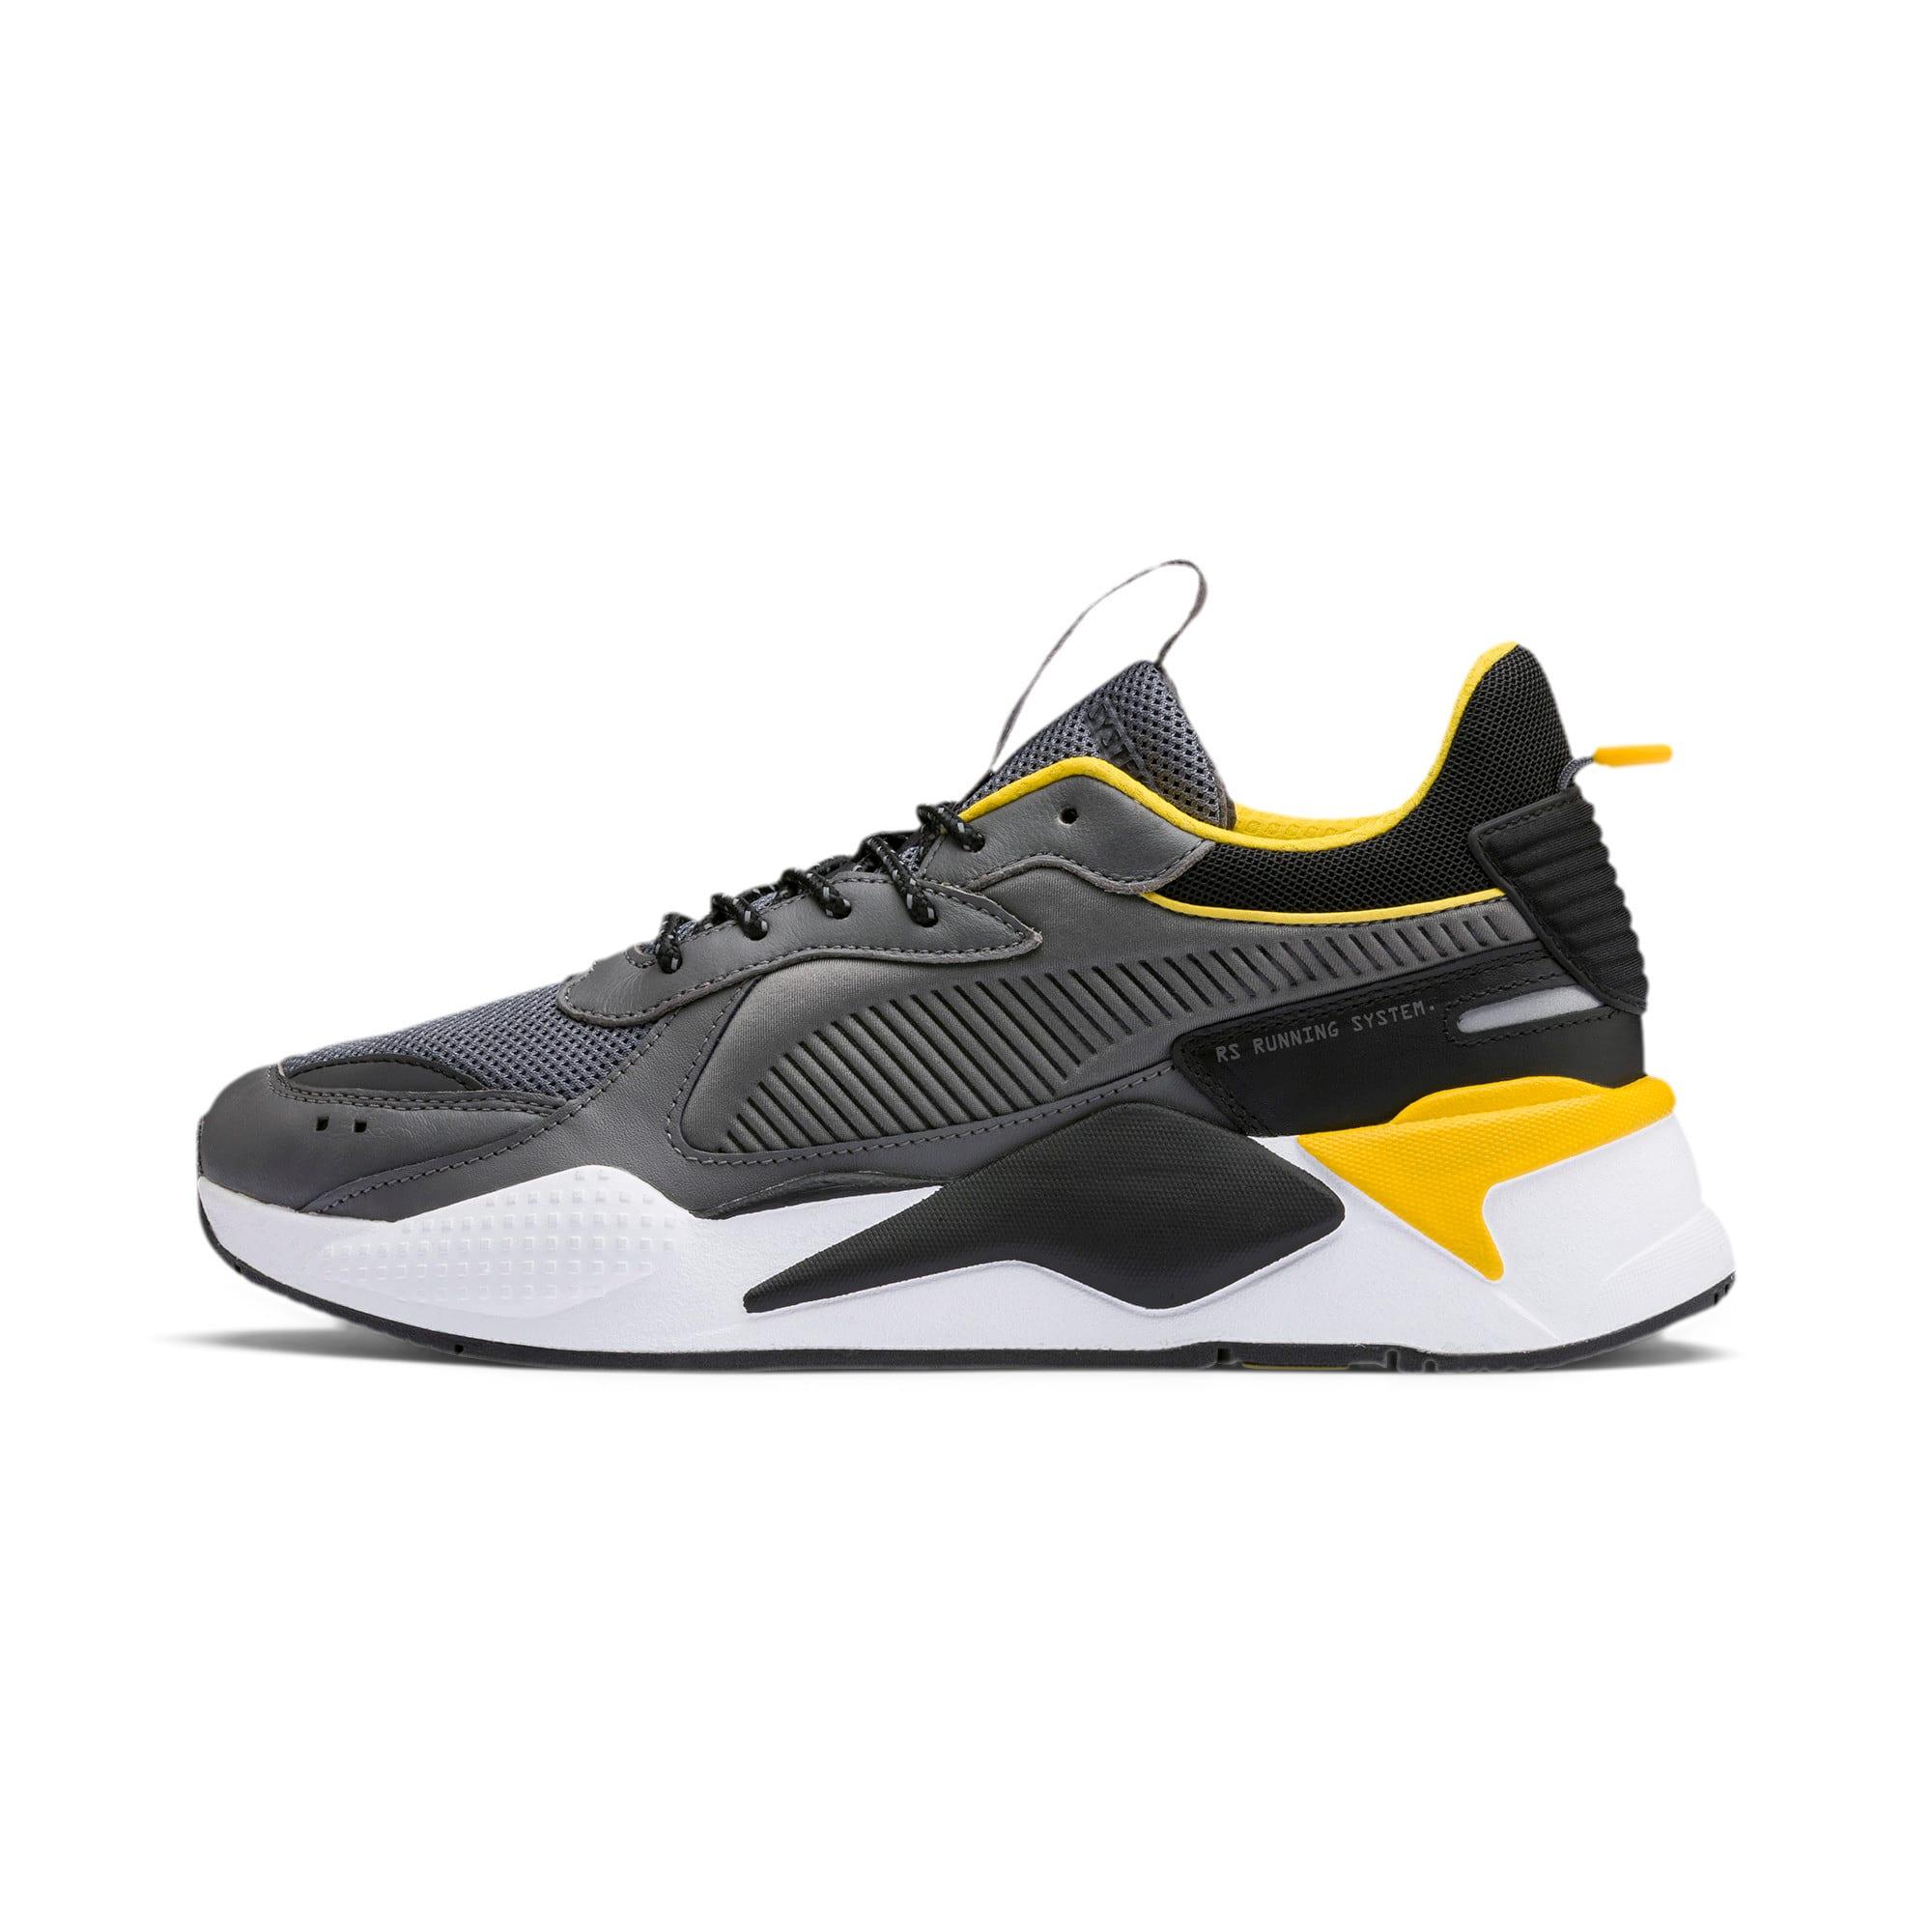 Thumbnail 1 of RS-X Core Sneakers, CASTLEROCK-Puma Black, medium